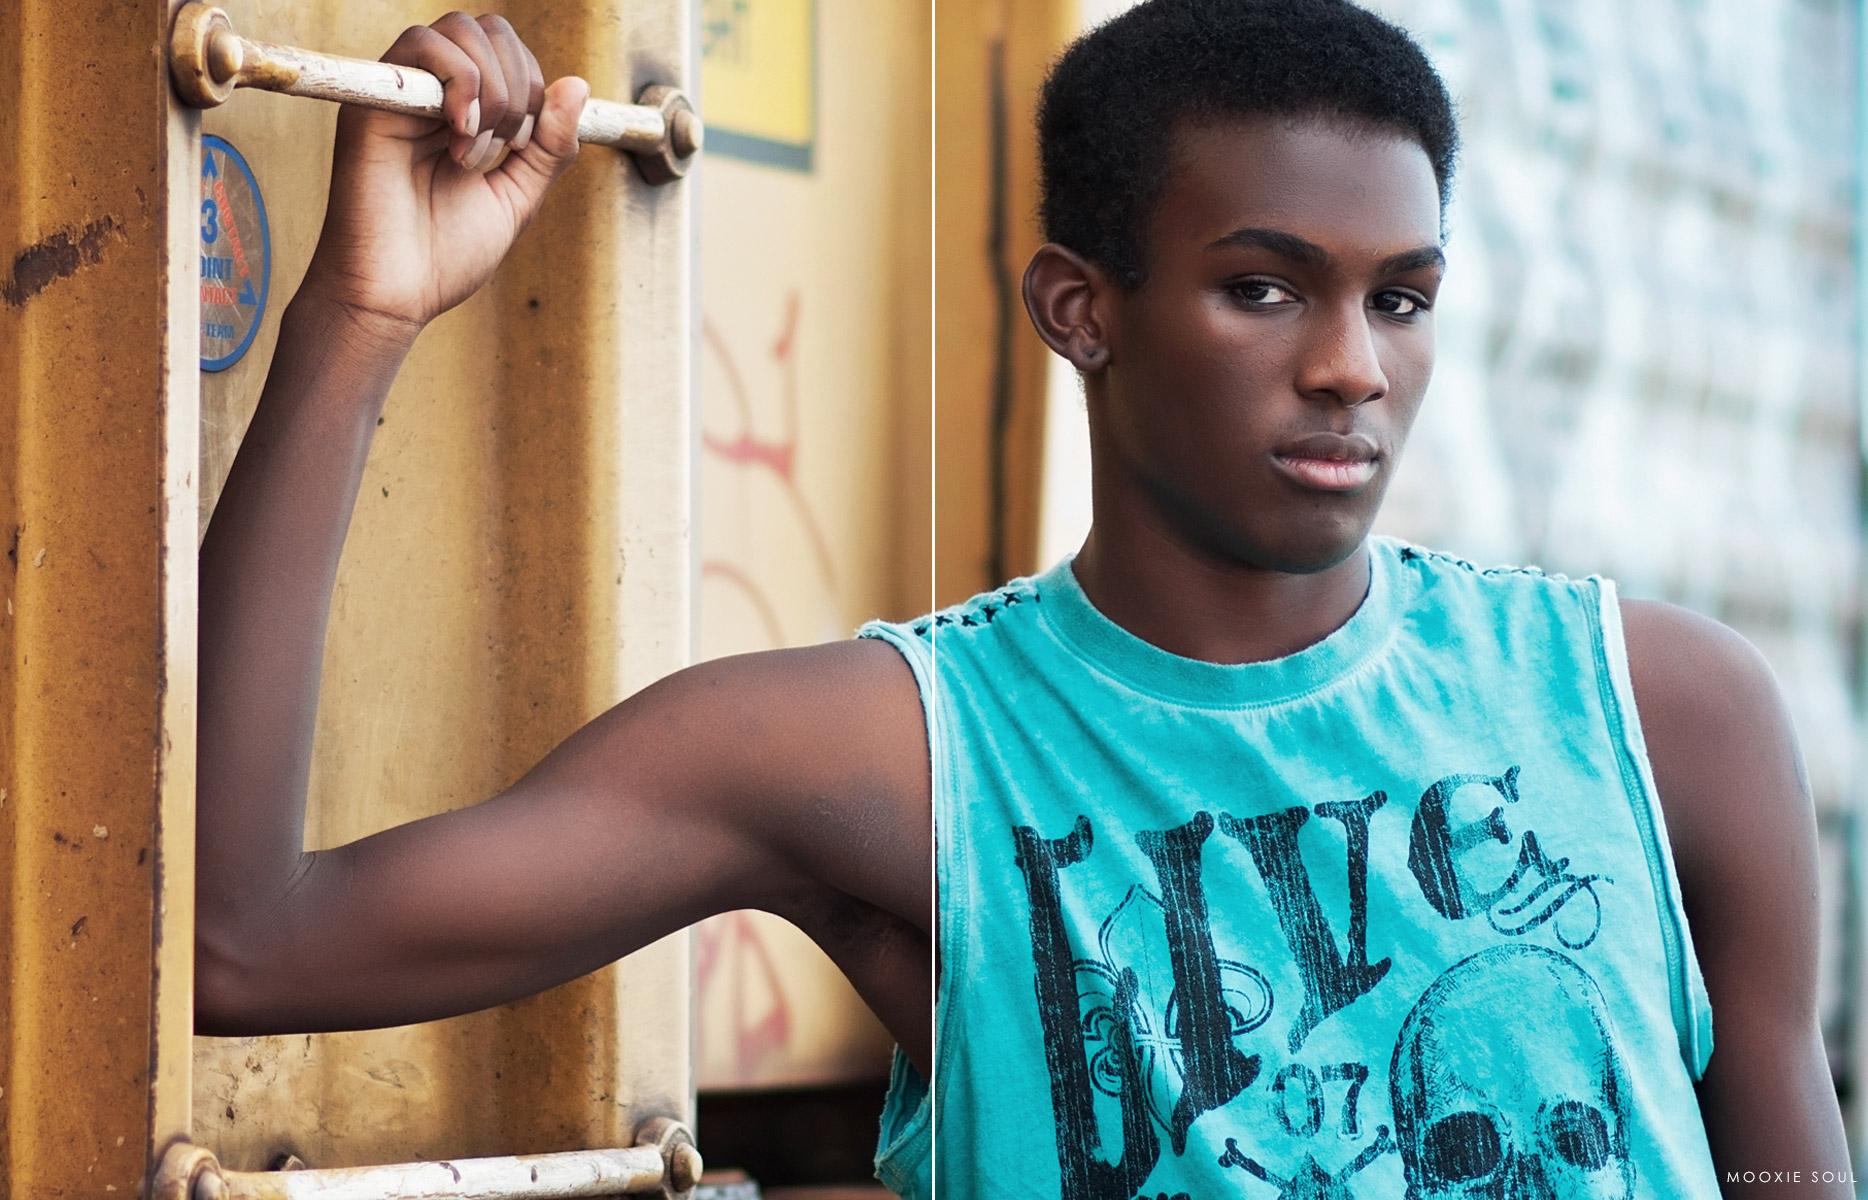 albuquerque-male-models.jpg